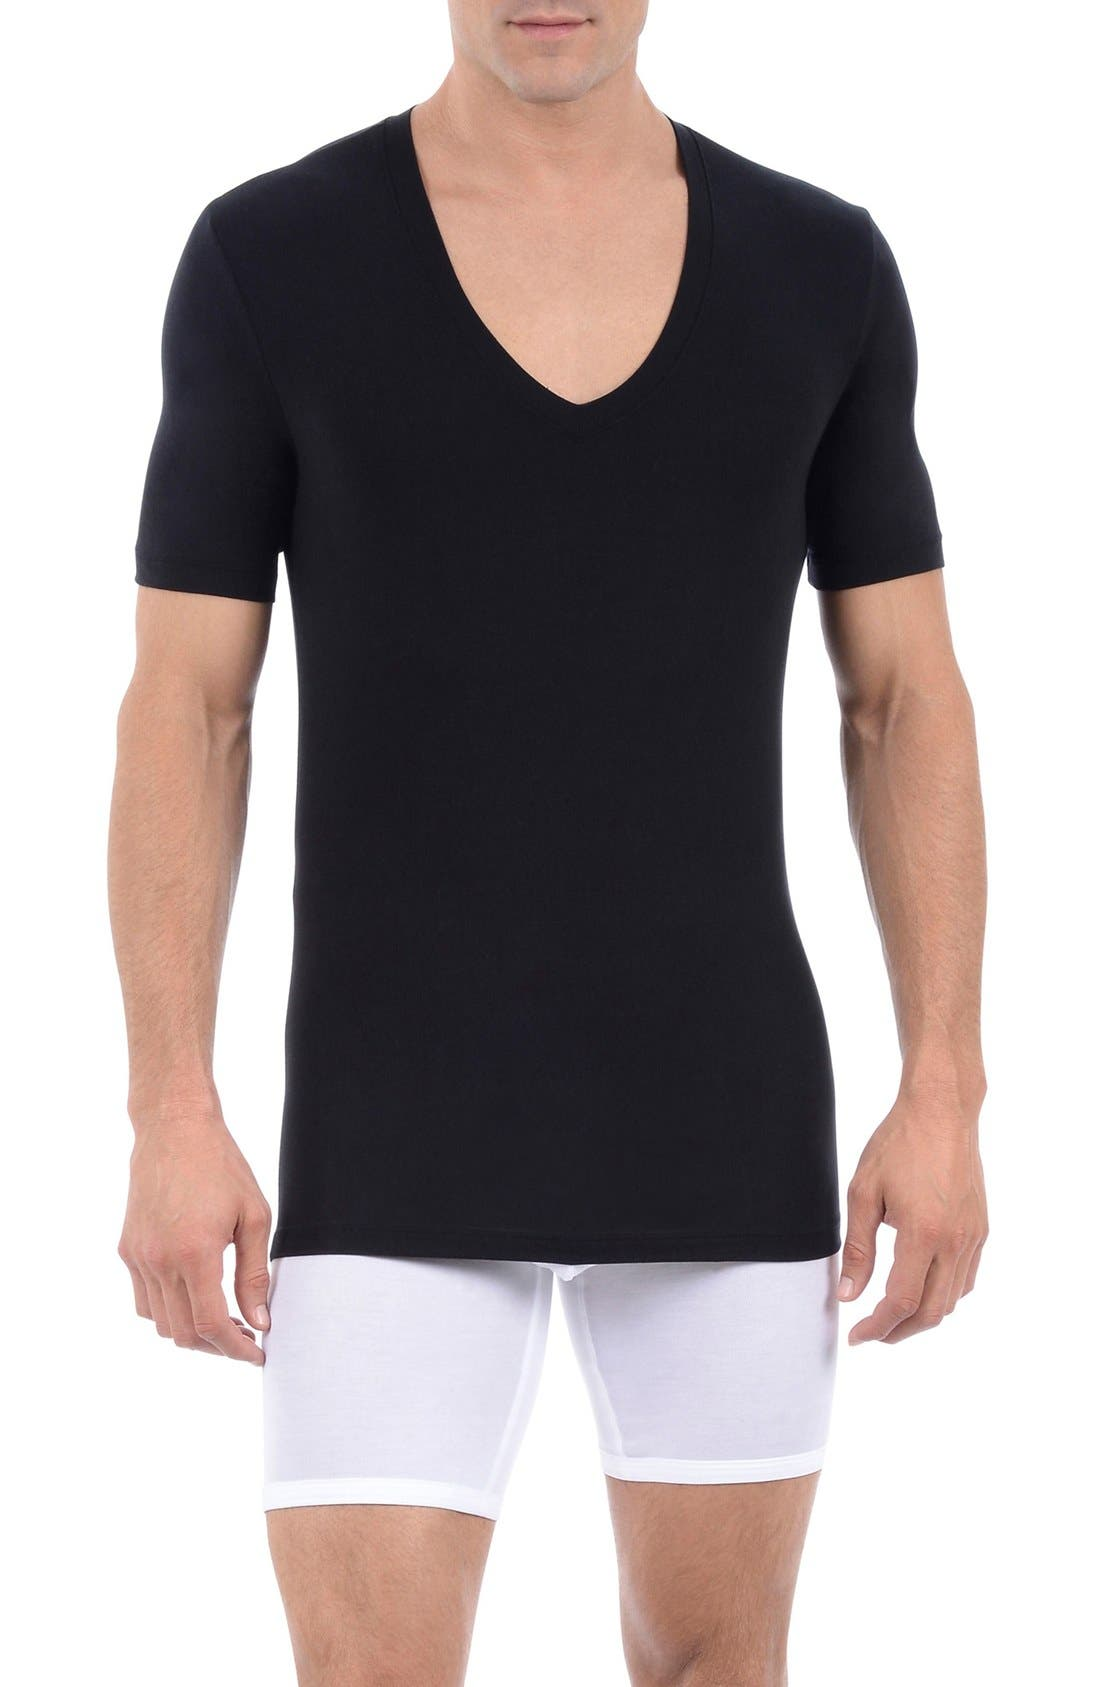 Main Image - Tommy John 'Cool Cotton' Deep V-Neck Undershirt